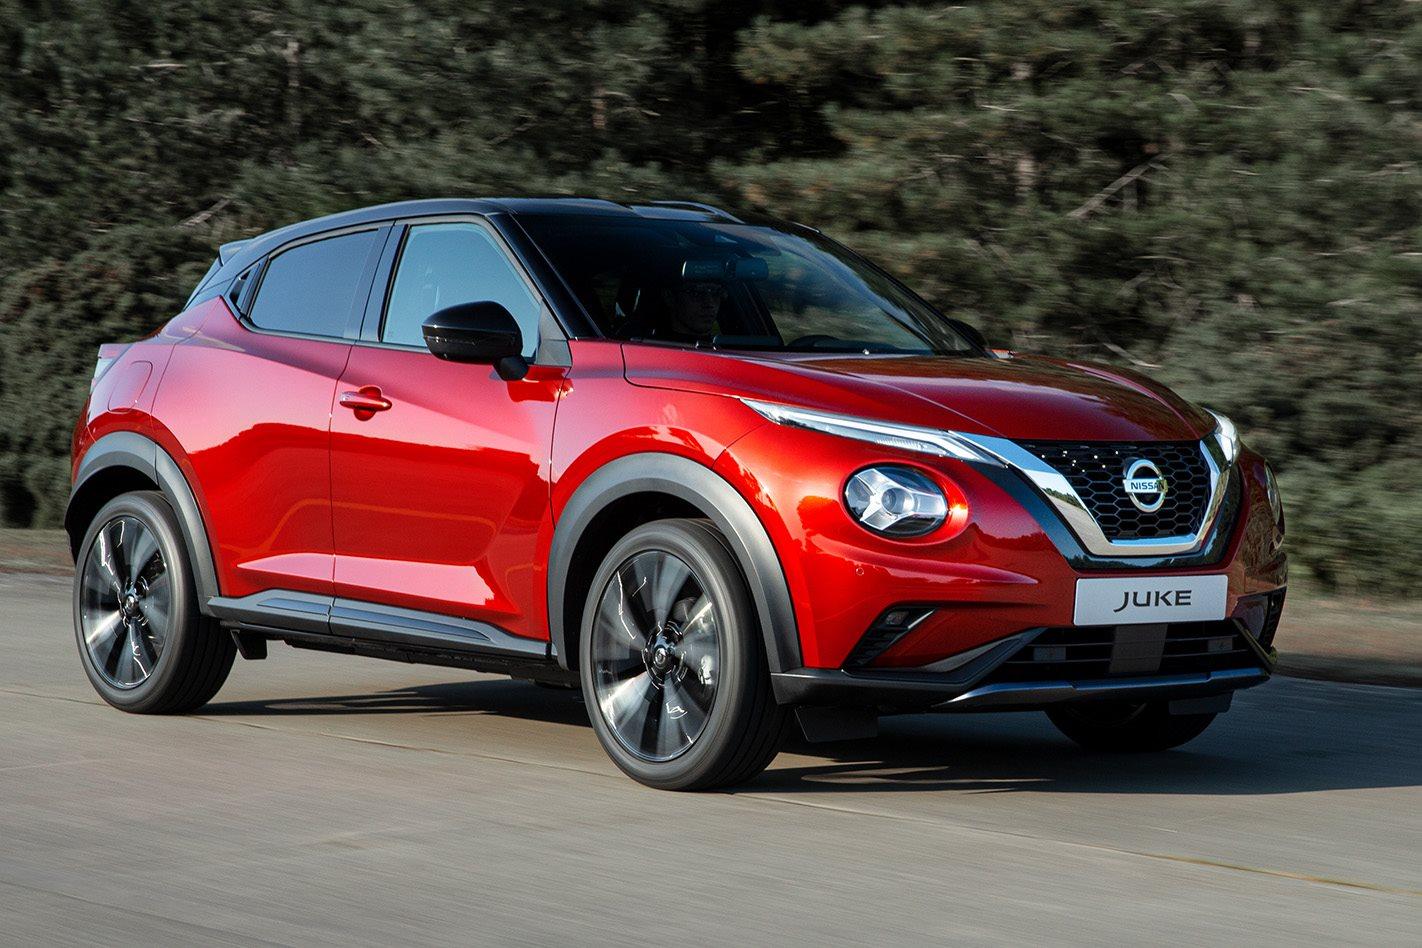 2020 Nissan Juke revealed